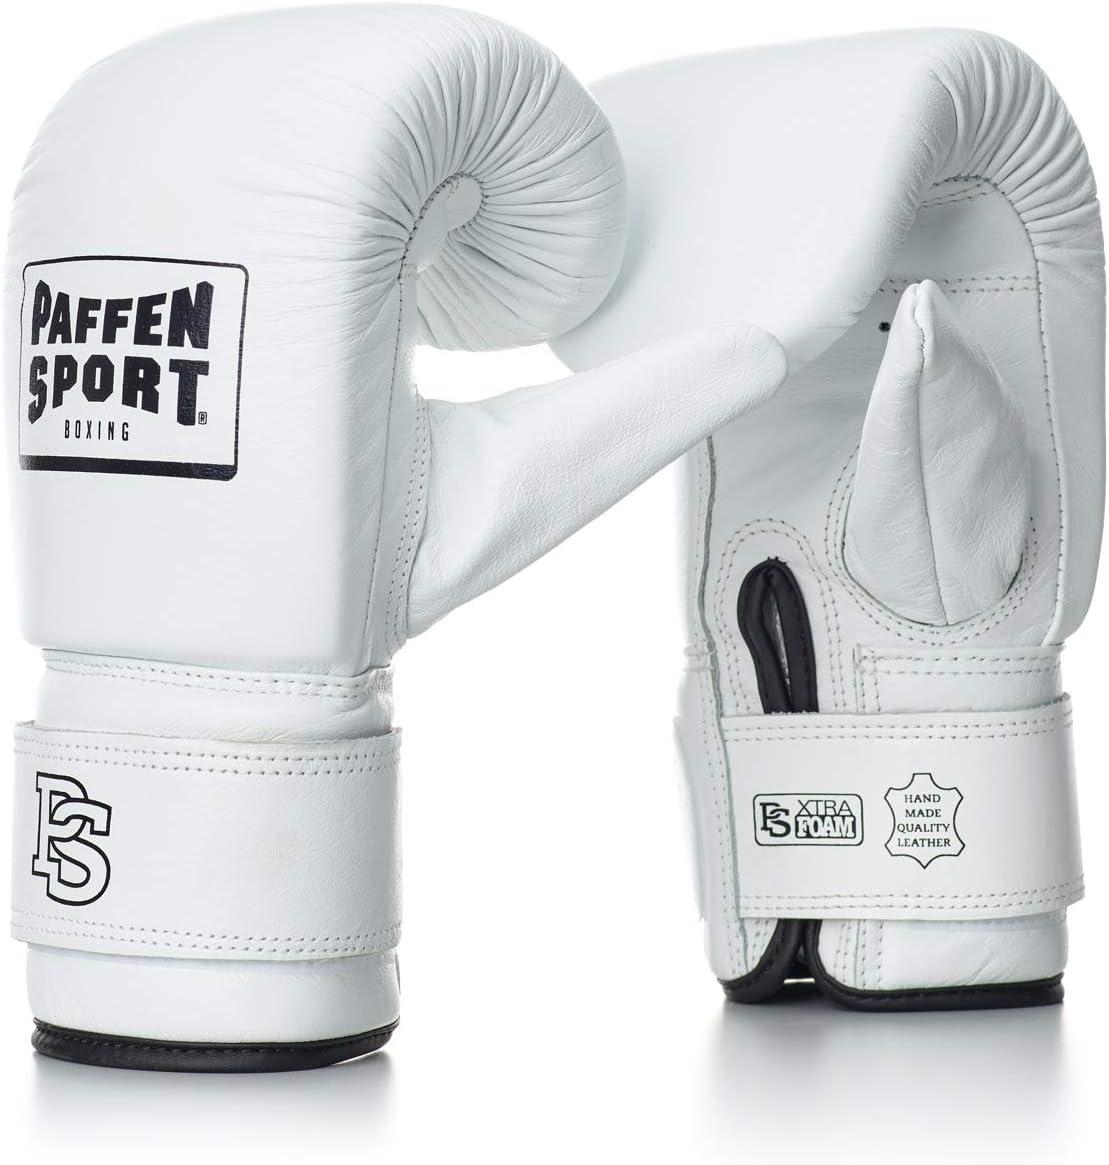 Paffen Sport PRO Bag gloves